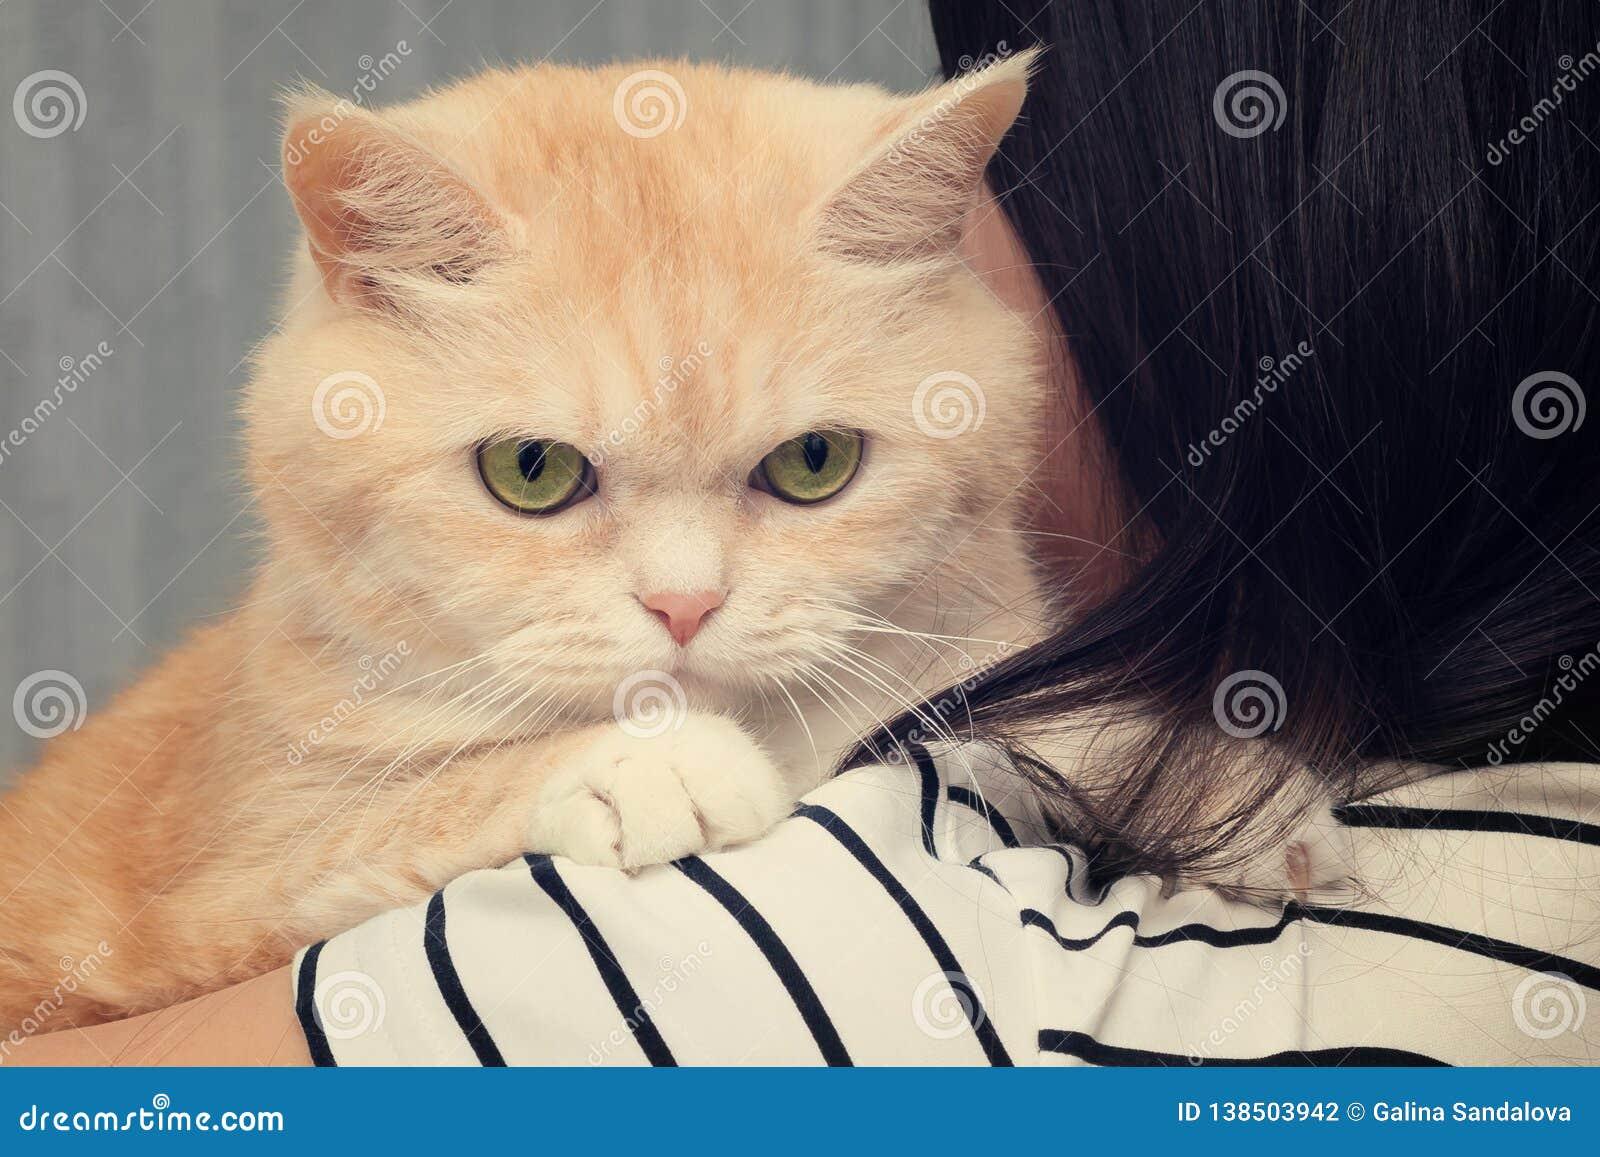 Красивый кот сливк сидит на плече темн-с волосами девушки